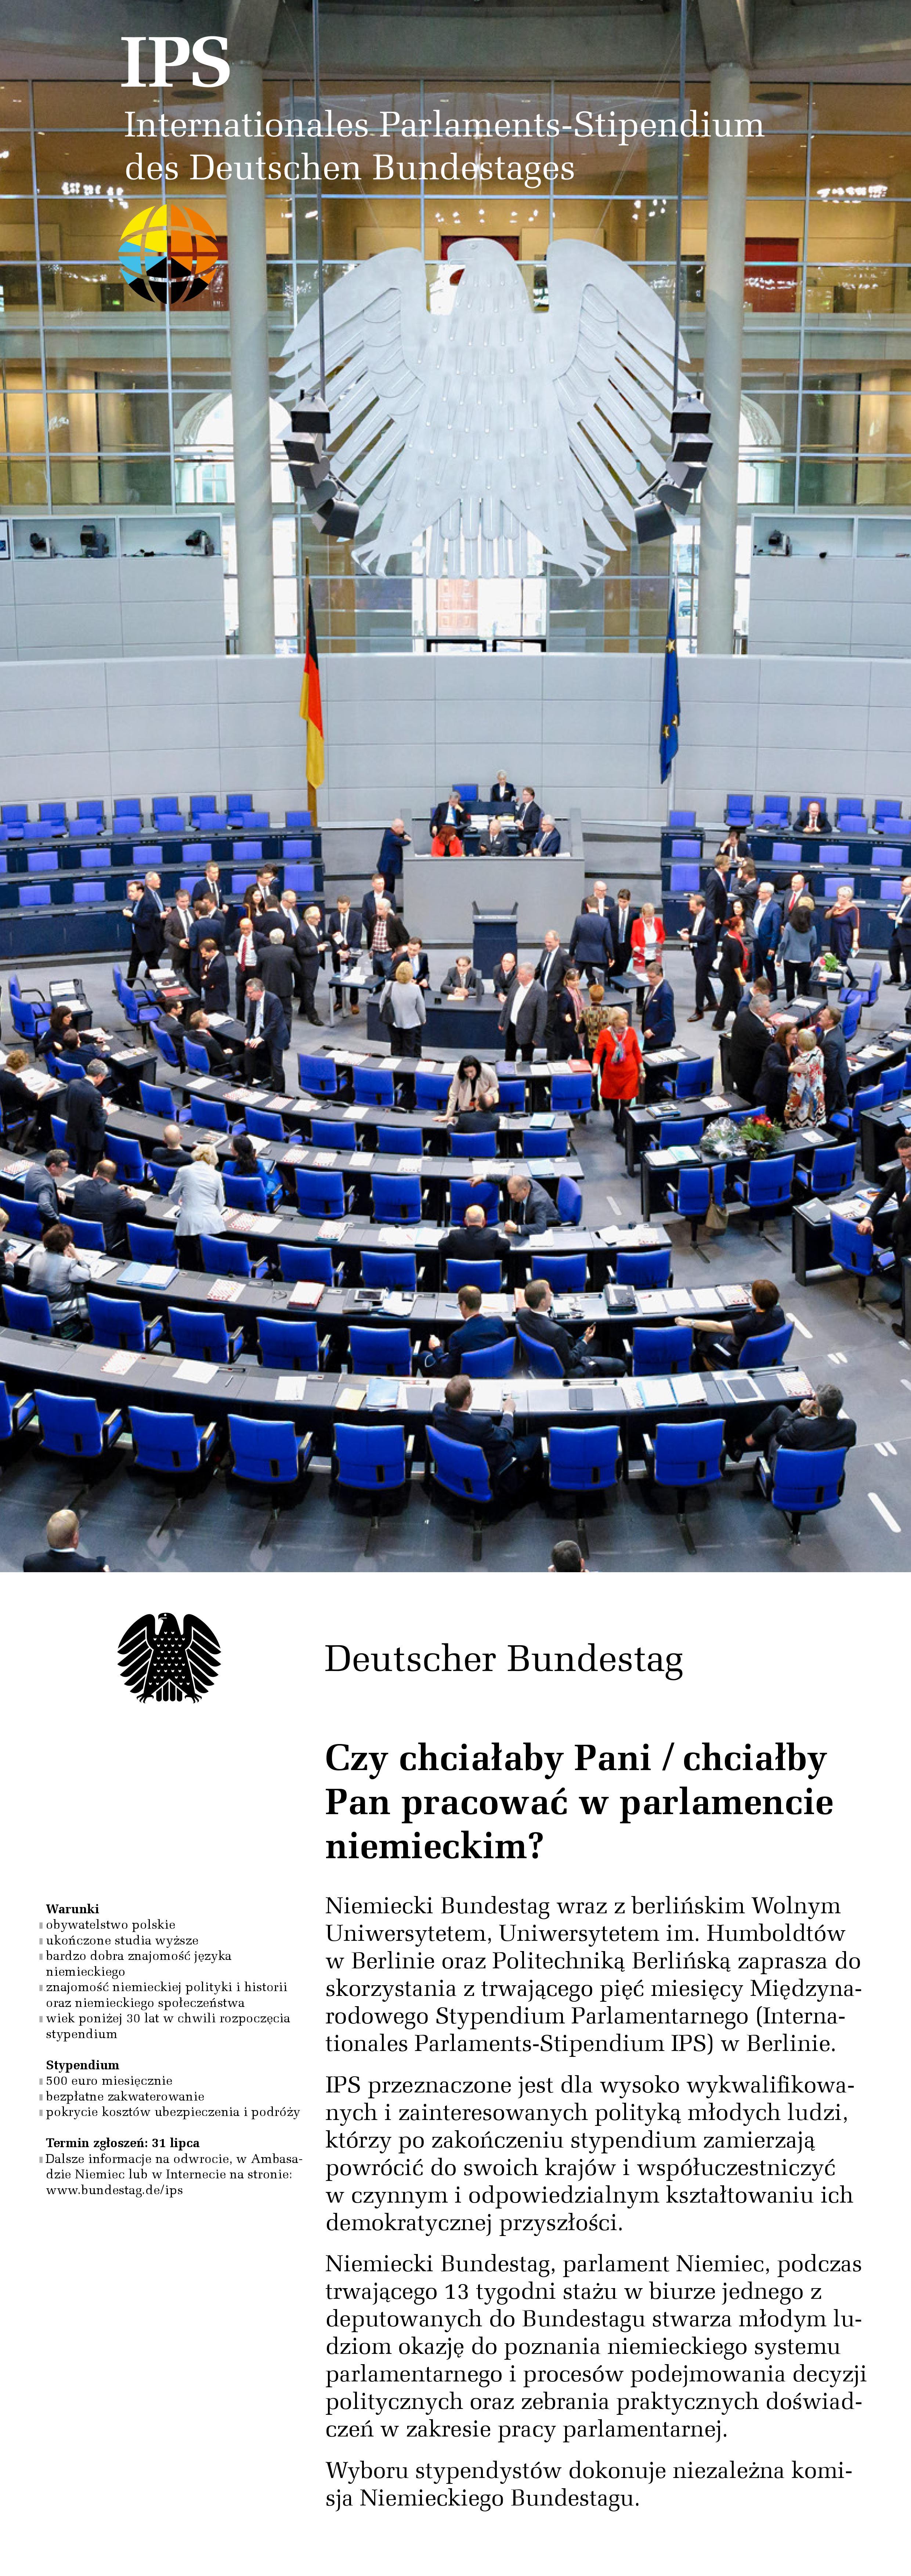 Międzynarodowe Stypendium Parlamentarne 2020